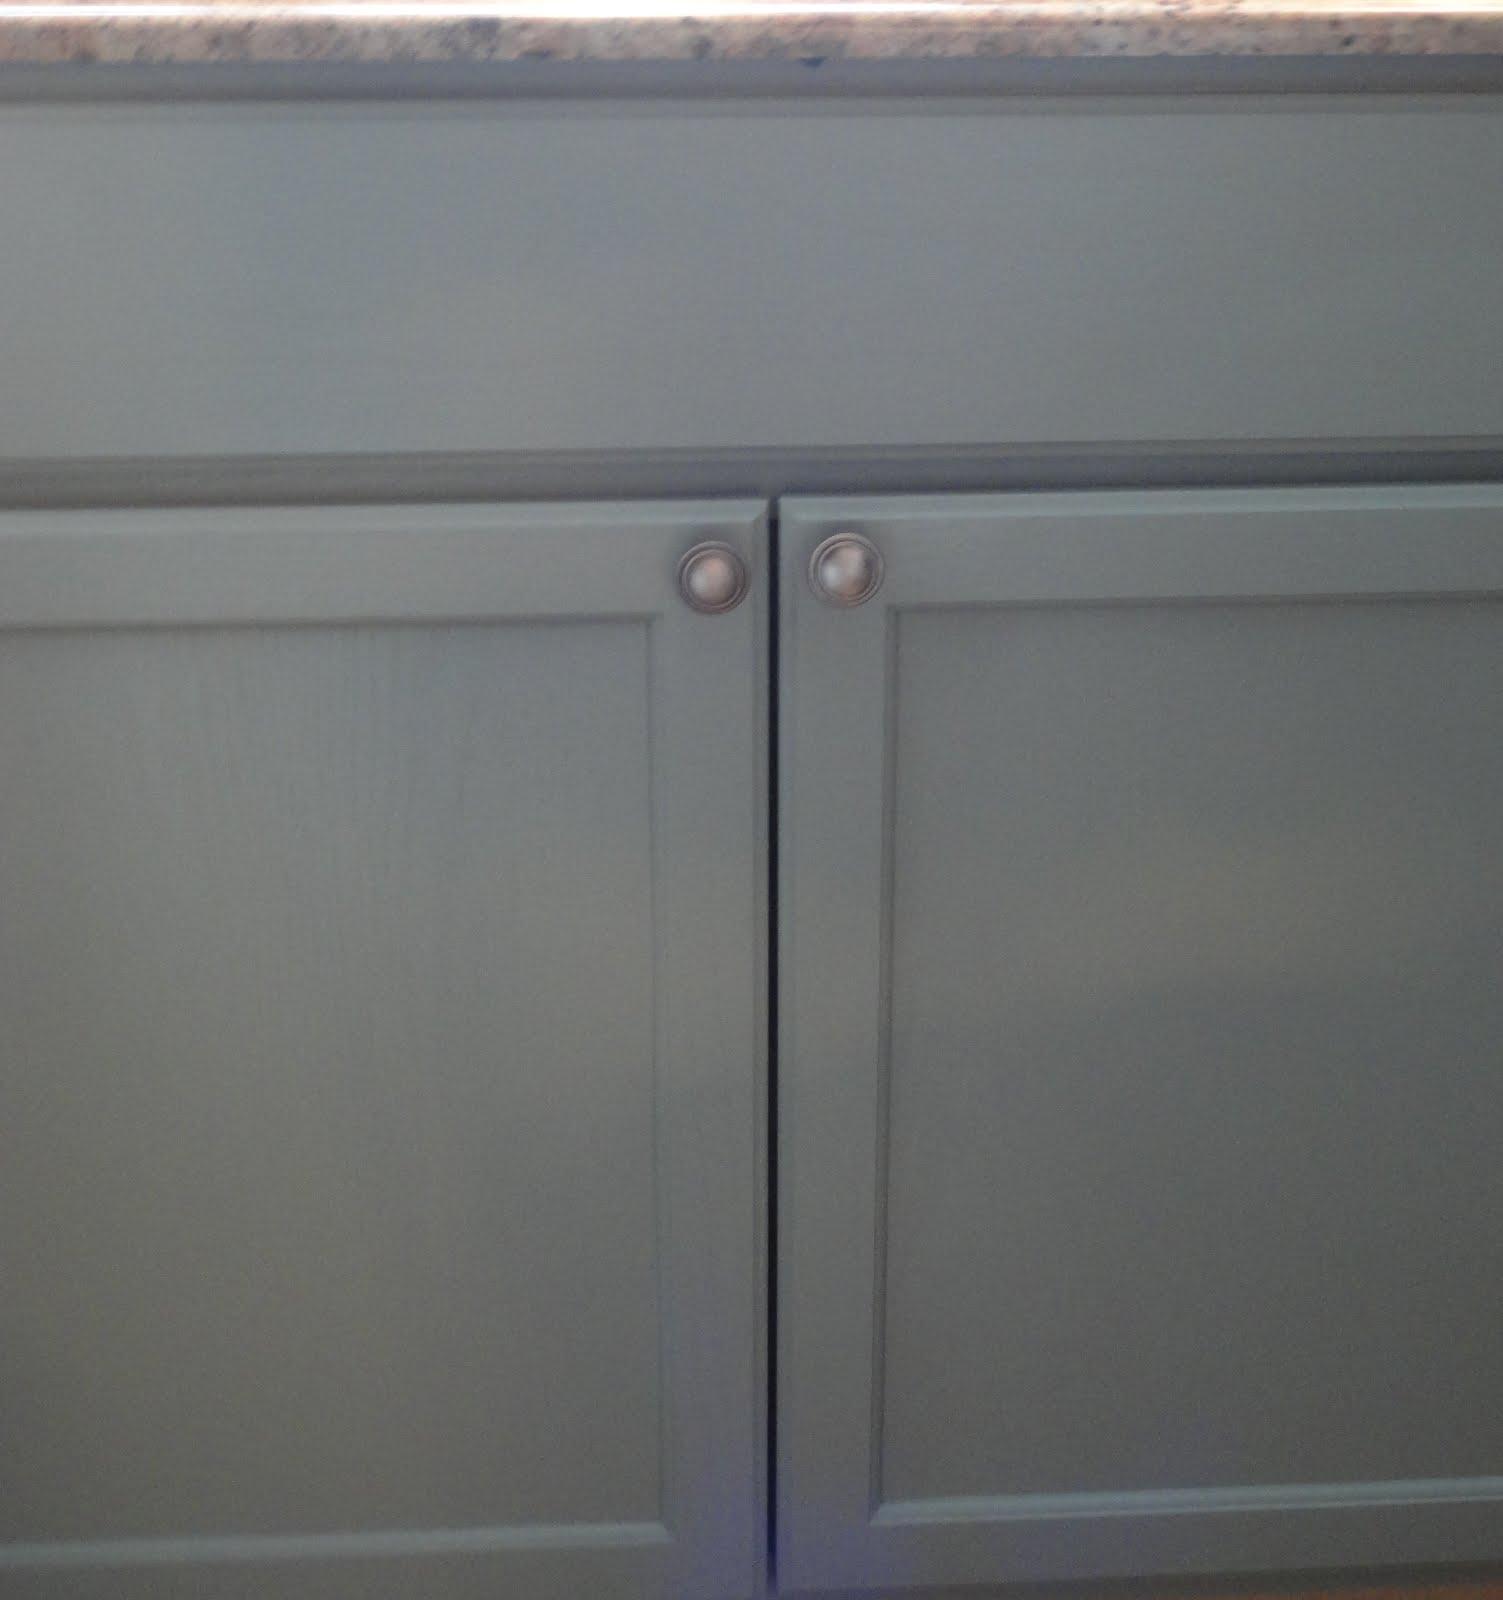 Decorative Glaze Rustoleum Craftsman 1204 Rustoleum Cabinet Transformations Kitchen Reno